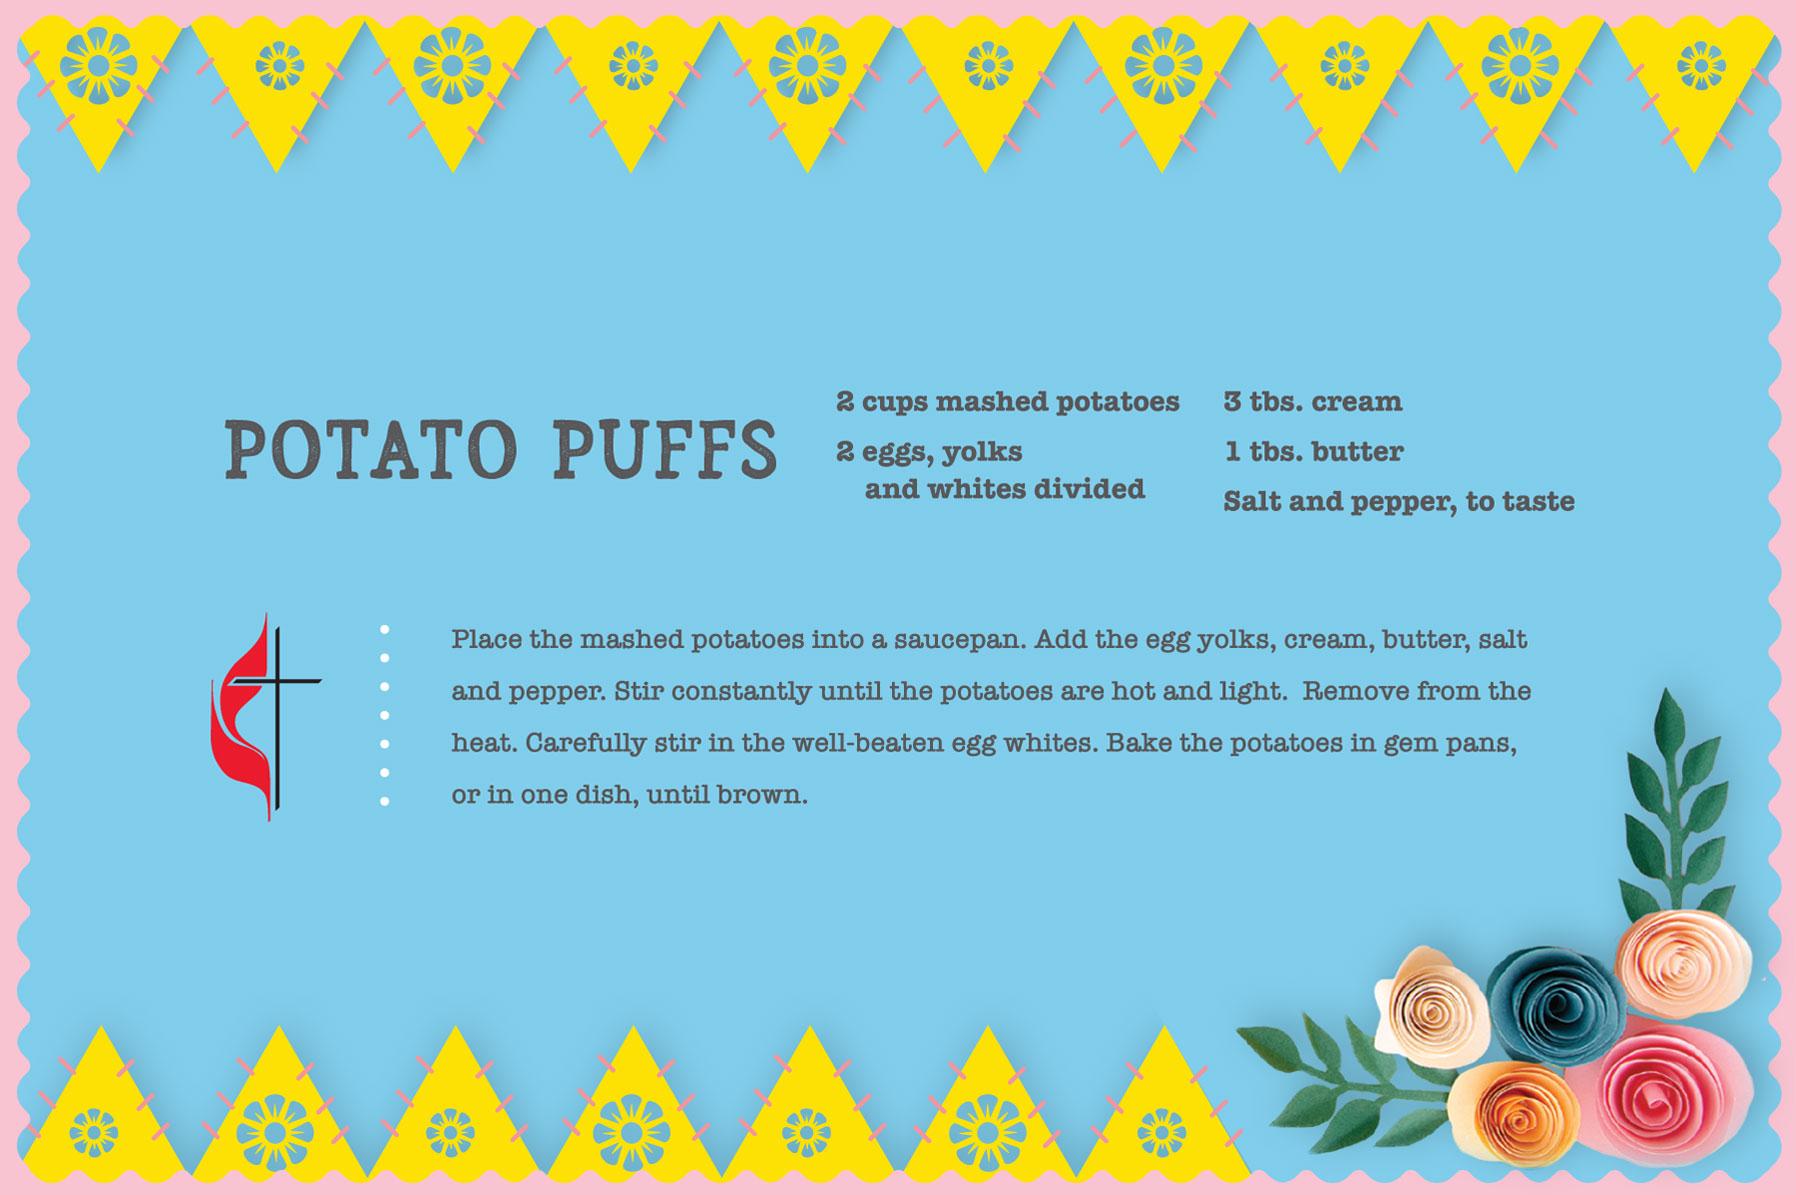 Vintage potato puffs recipe for Easter. Design by Sara Schork, United Methodist Communications